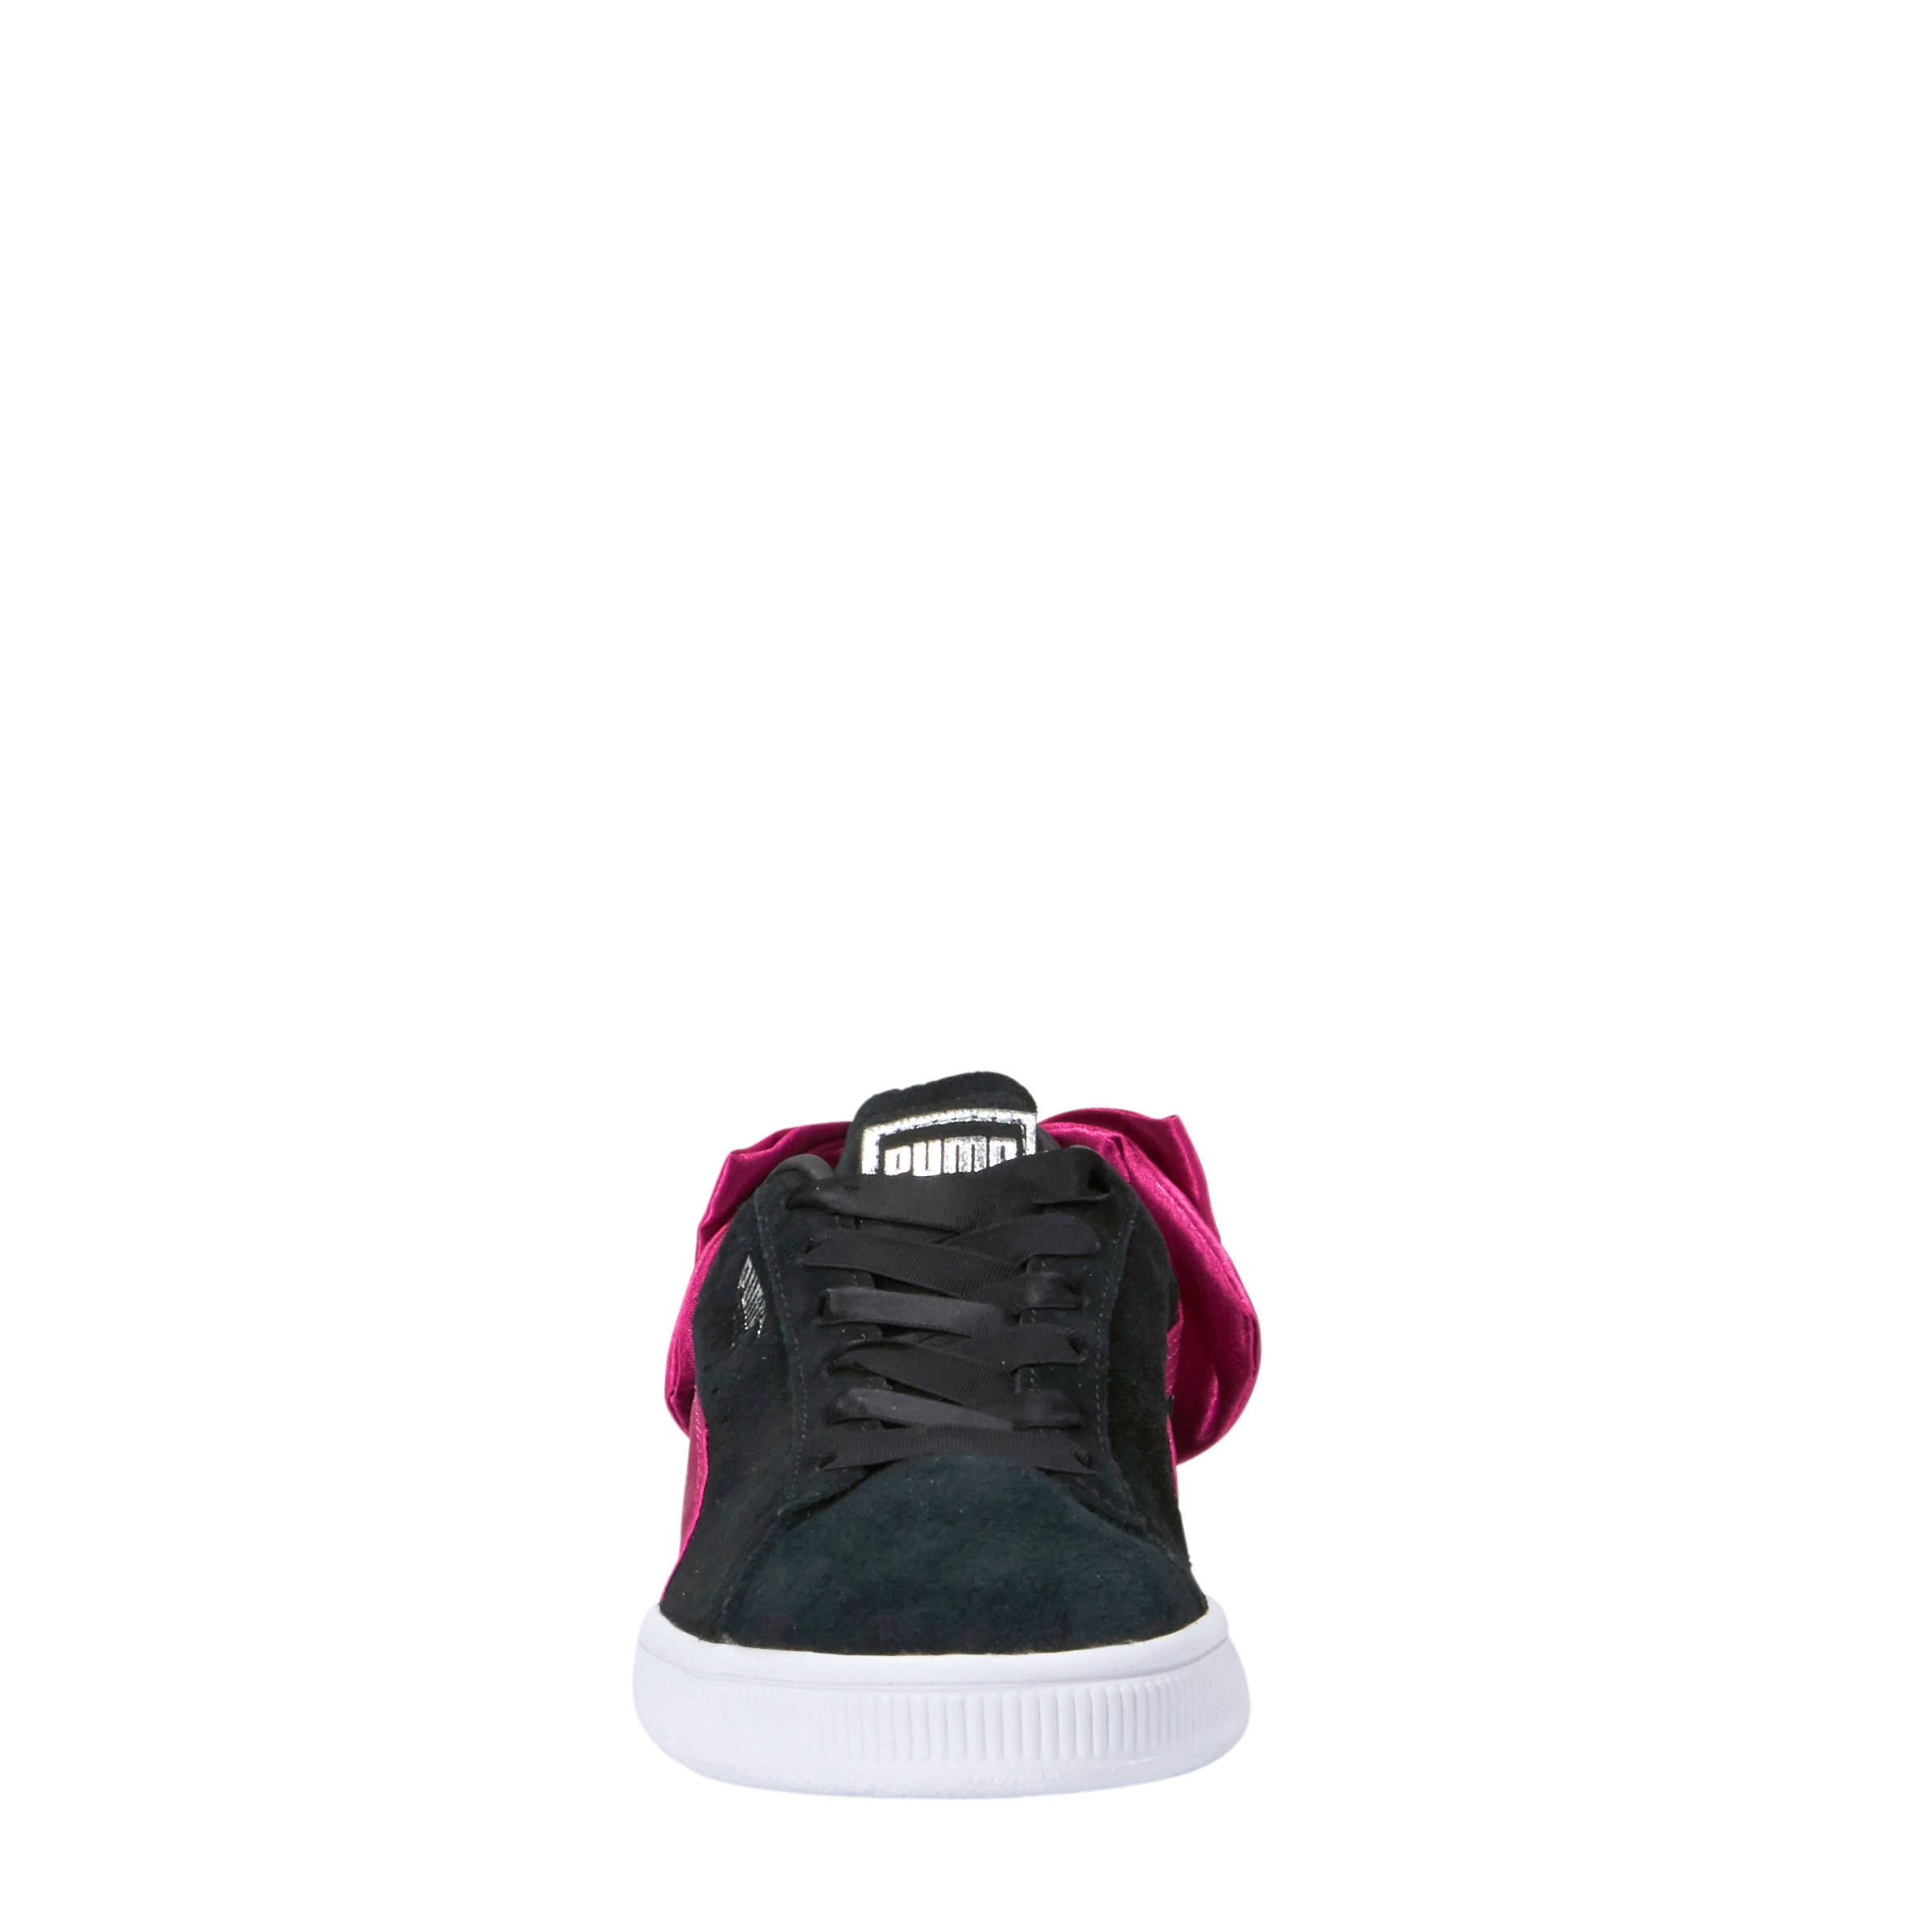 Puma Suède Bow AC PS sneakers zwartroze | wehkamp